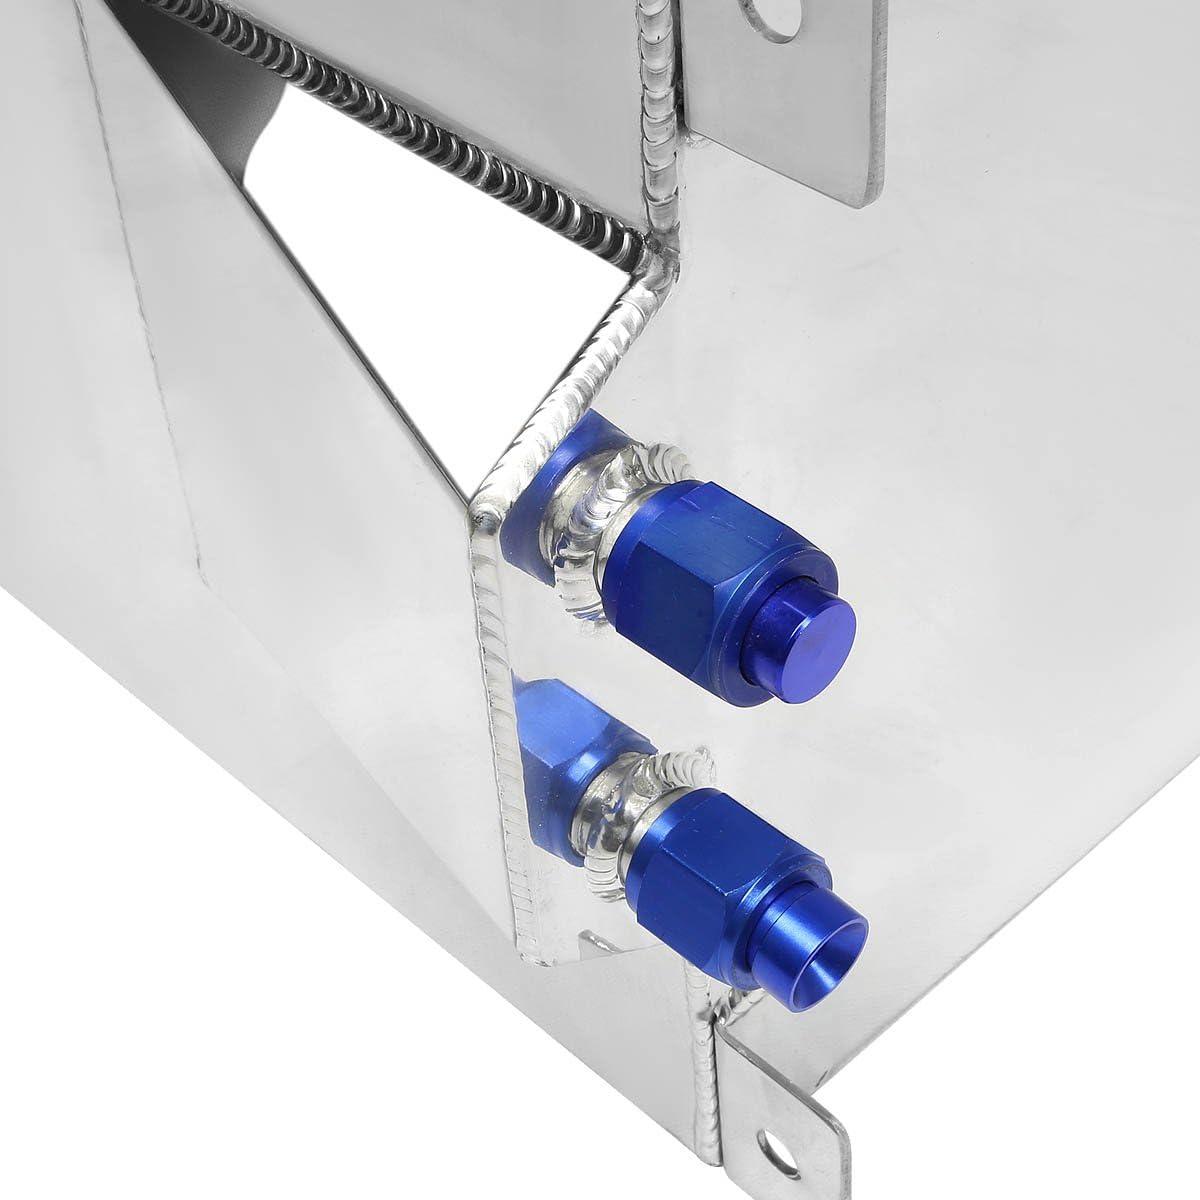 DNA MOTORING ALU-FT-T5-RD Aluminum 15.5-Gallon Fuel Cell Gas Tank